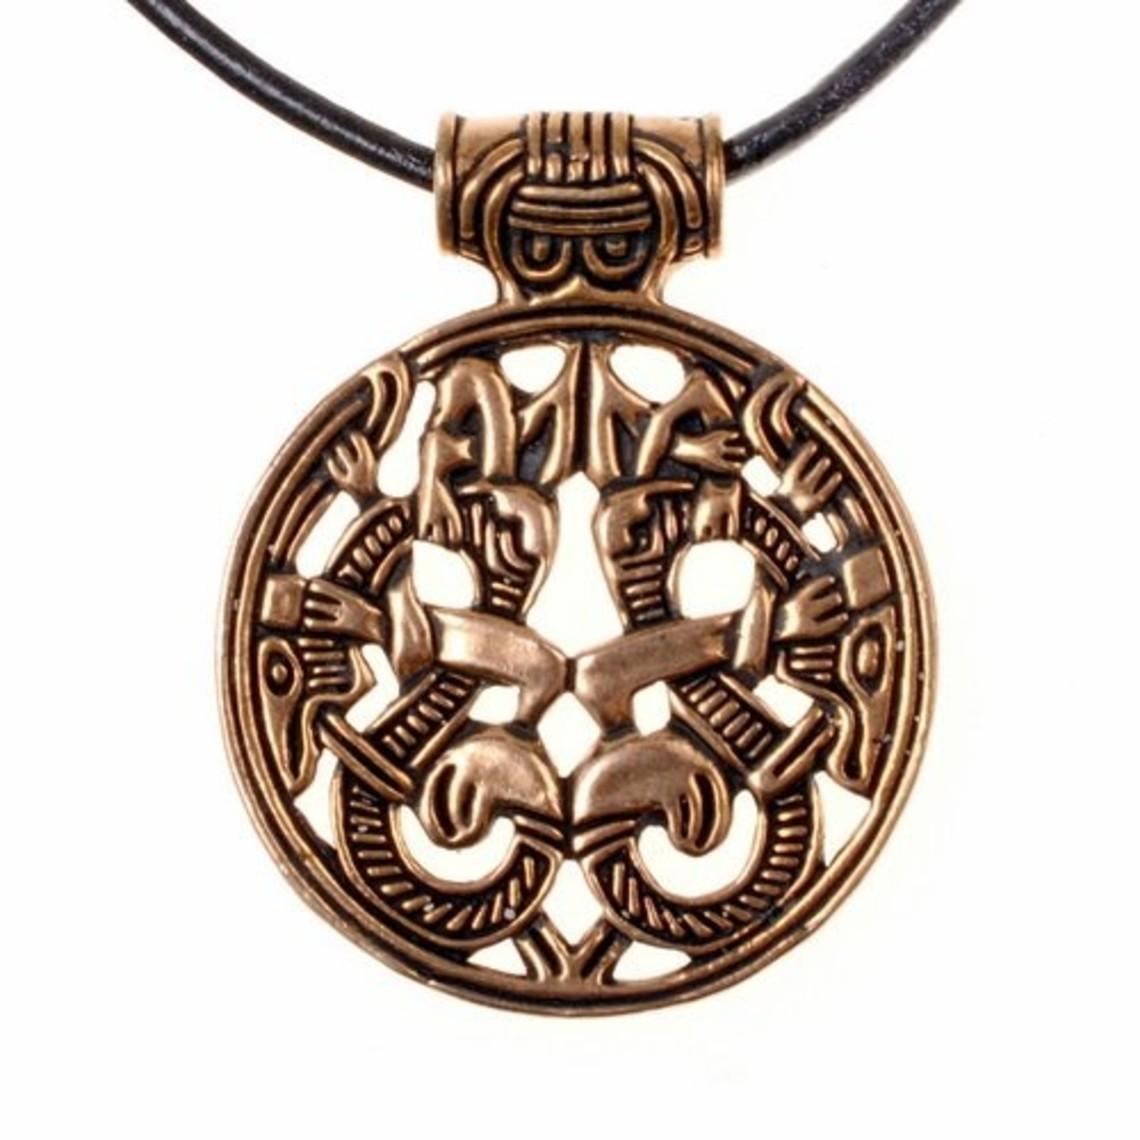 Varby Jellinge gioiello, bronzo